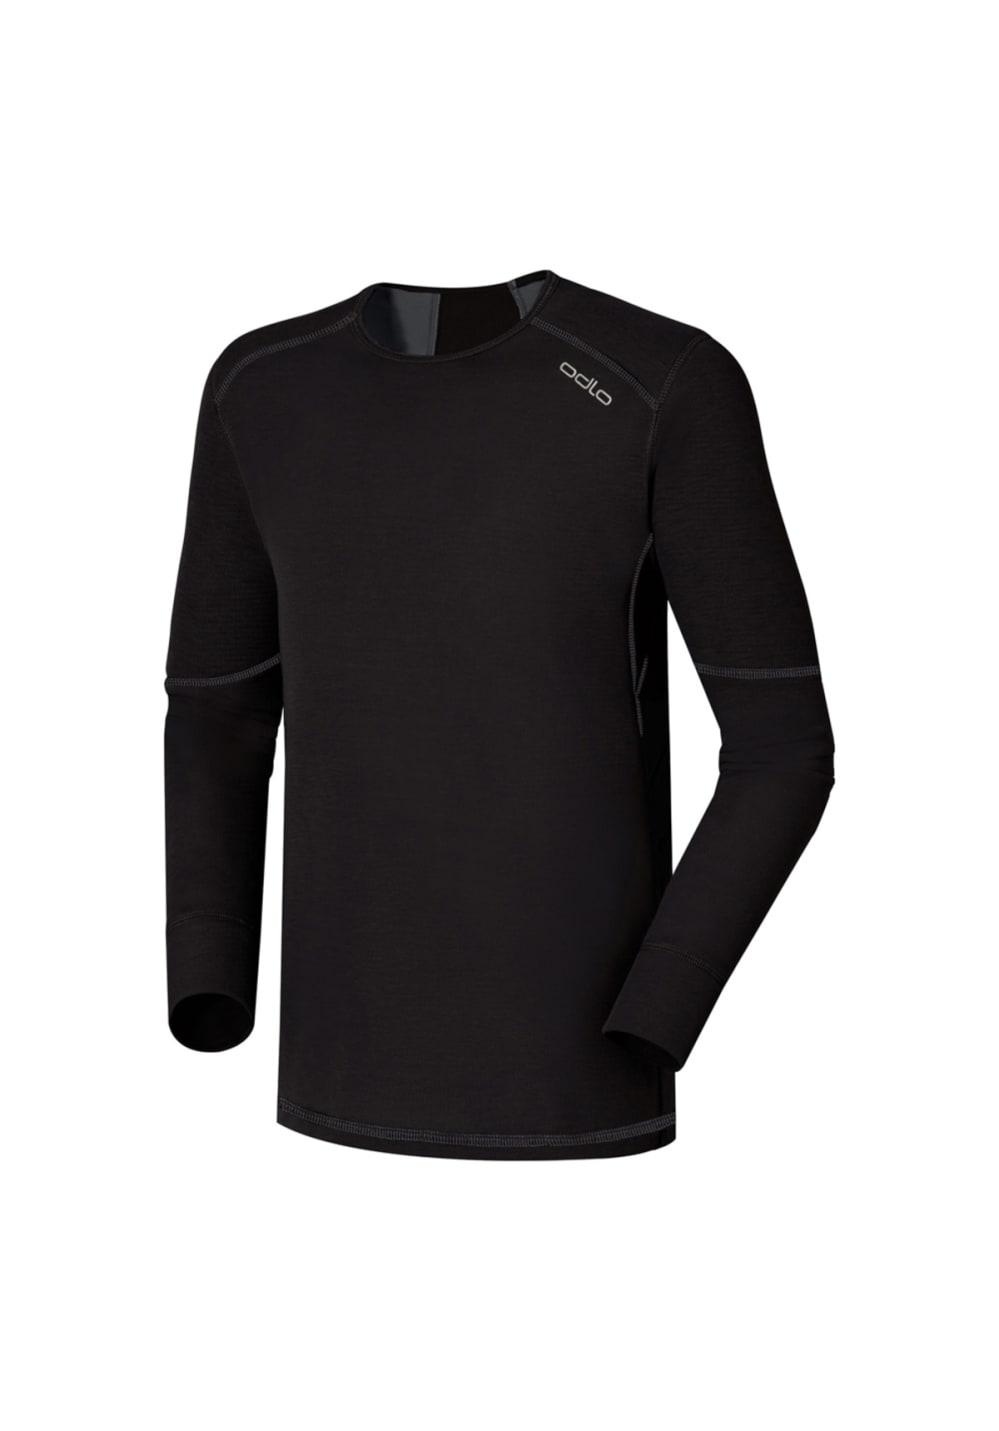 Odlo Shirt Longsleeve Crew Neck X-Warm - Funktionsunterwäsche für Kinder Unise